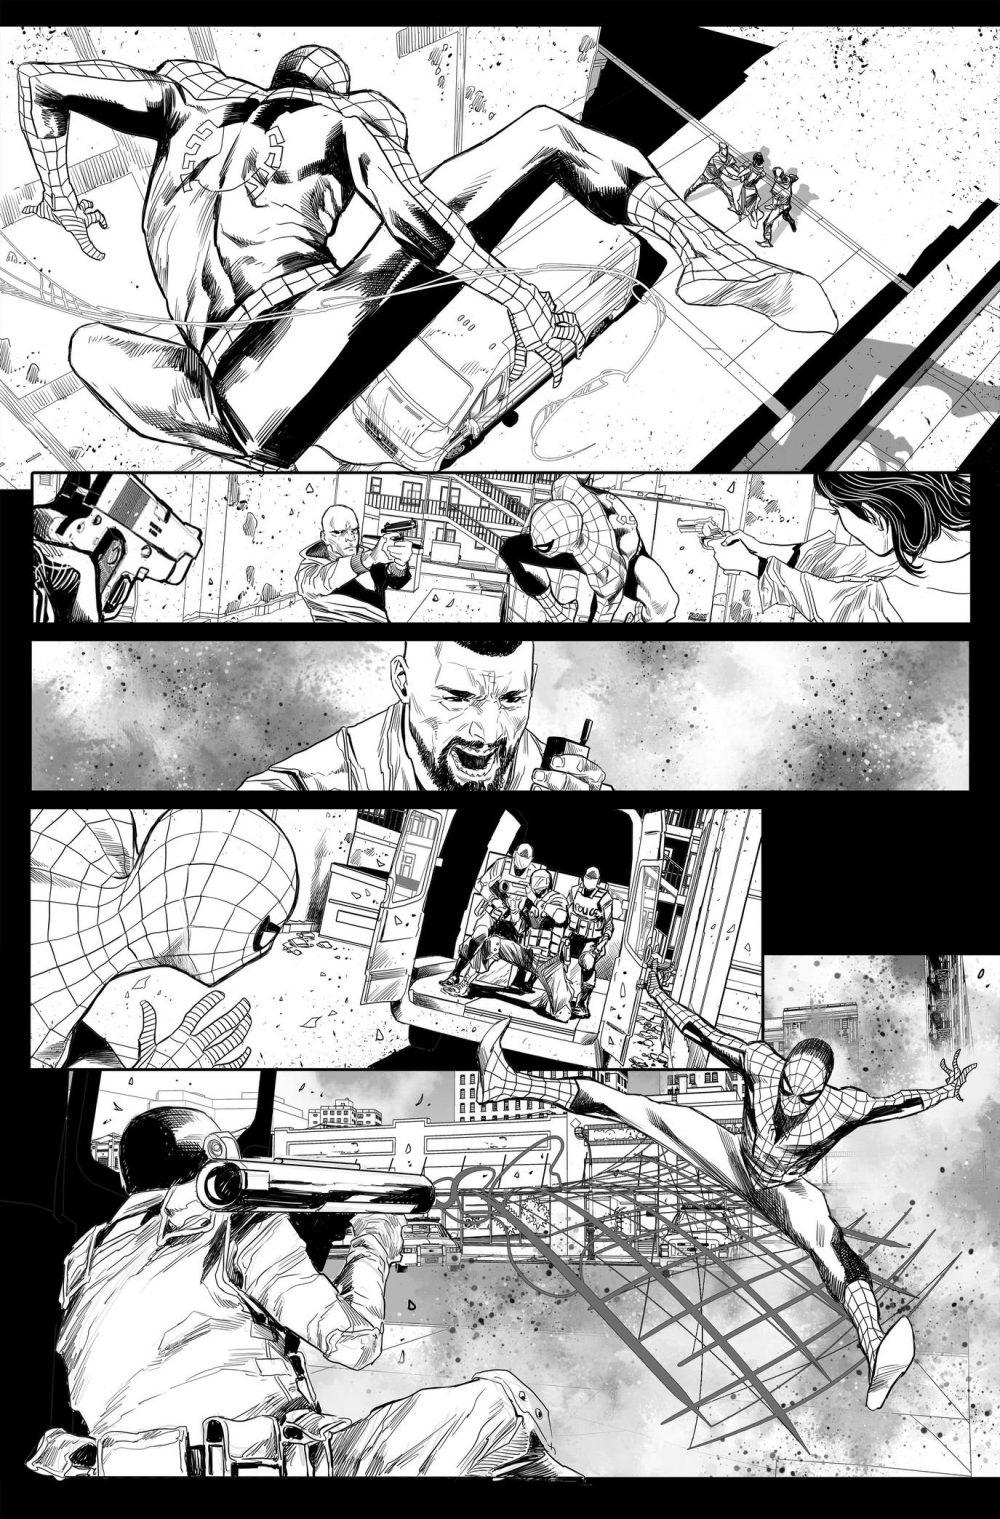 Daredevil #11, anteprima 02 (chine)